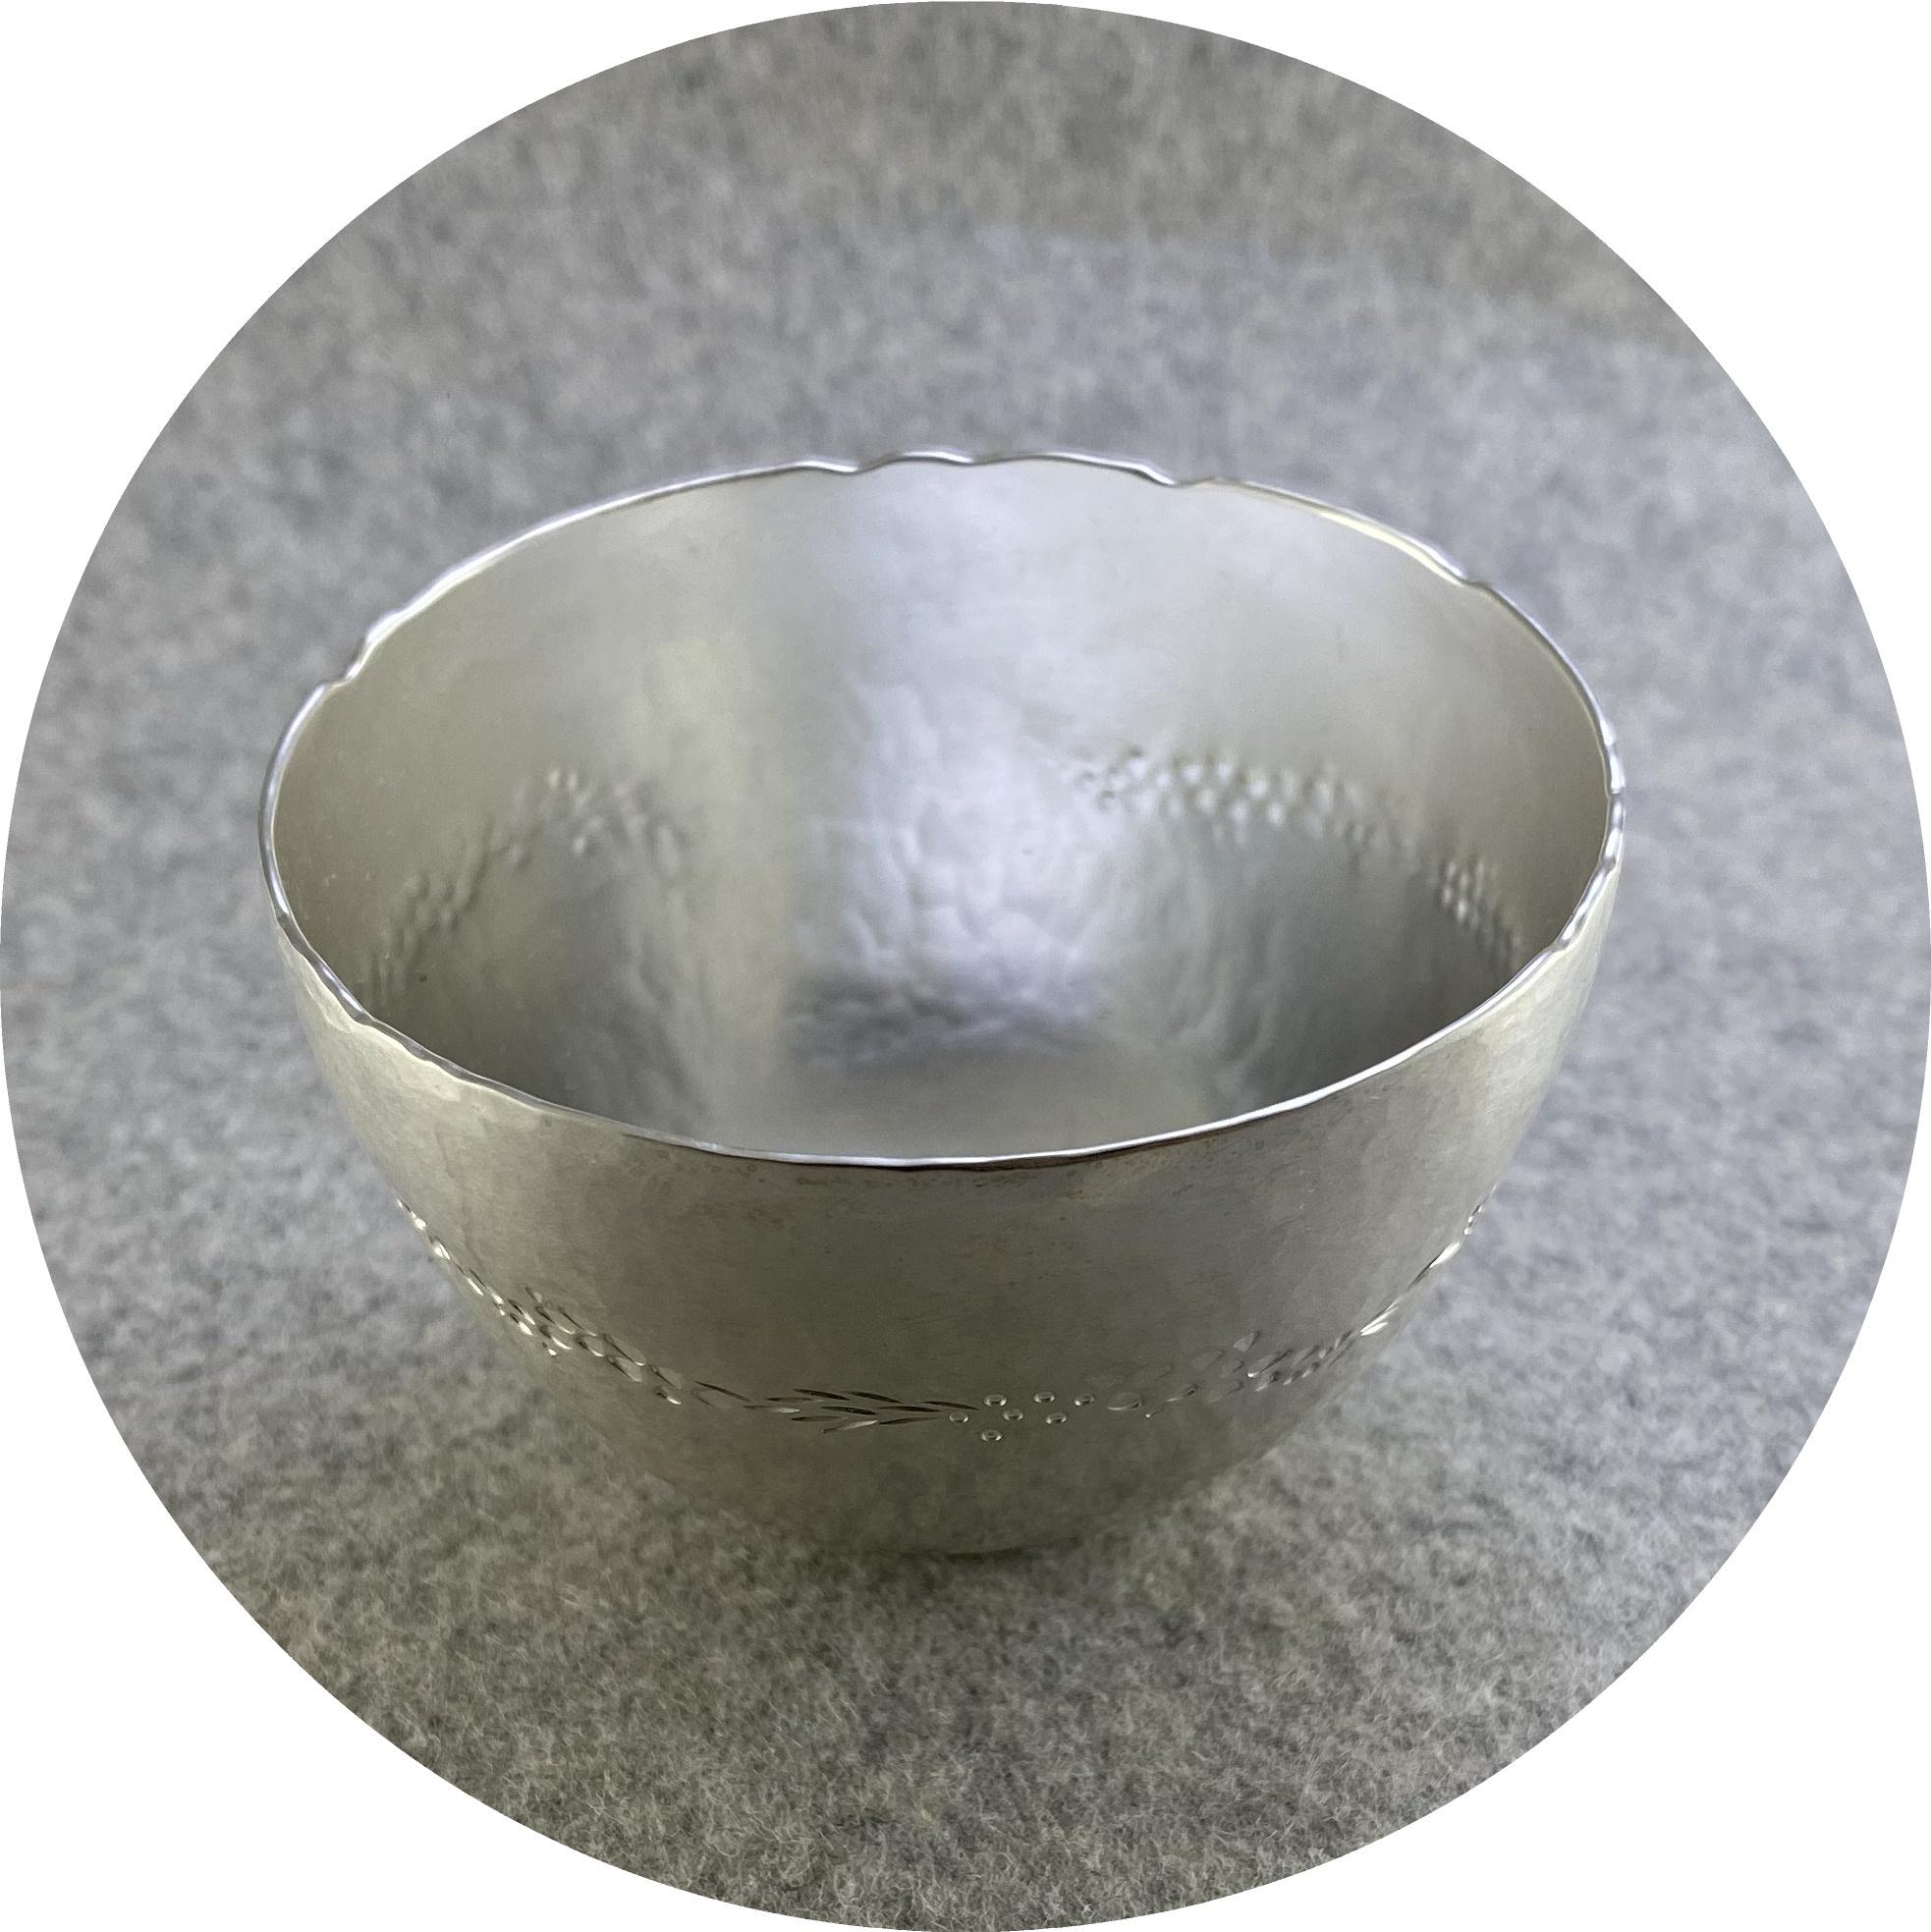 Marissa Ziesing - 'Whisky Tumbler', 925 silver